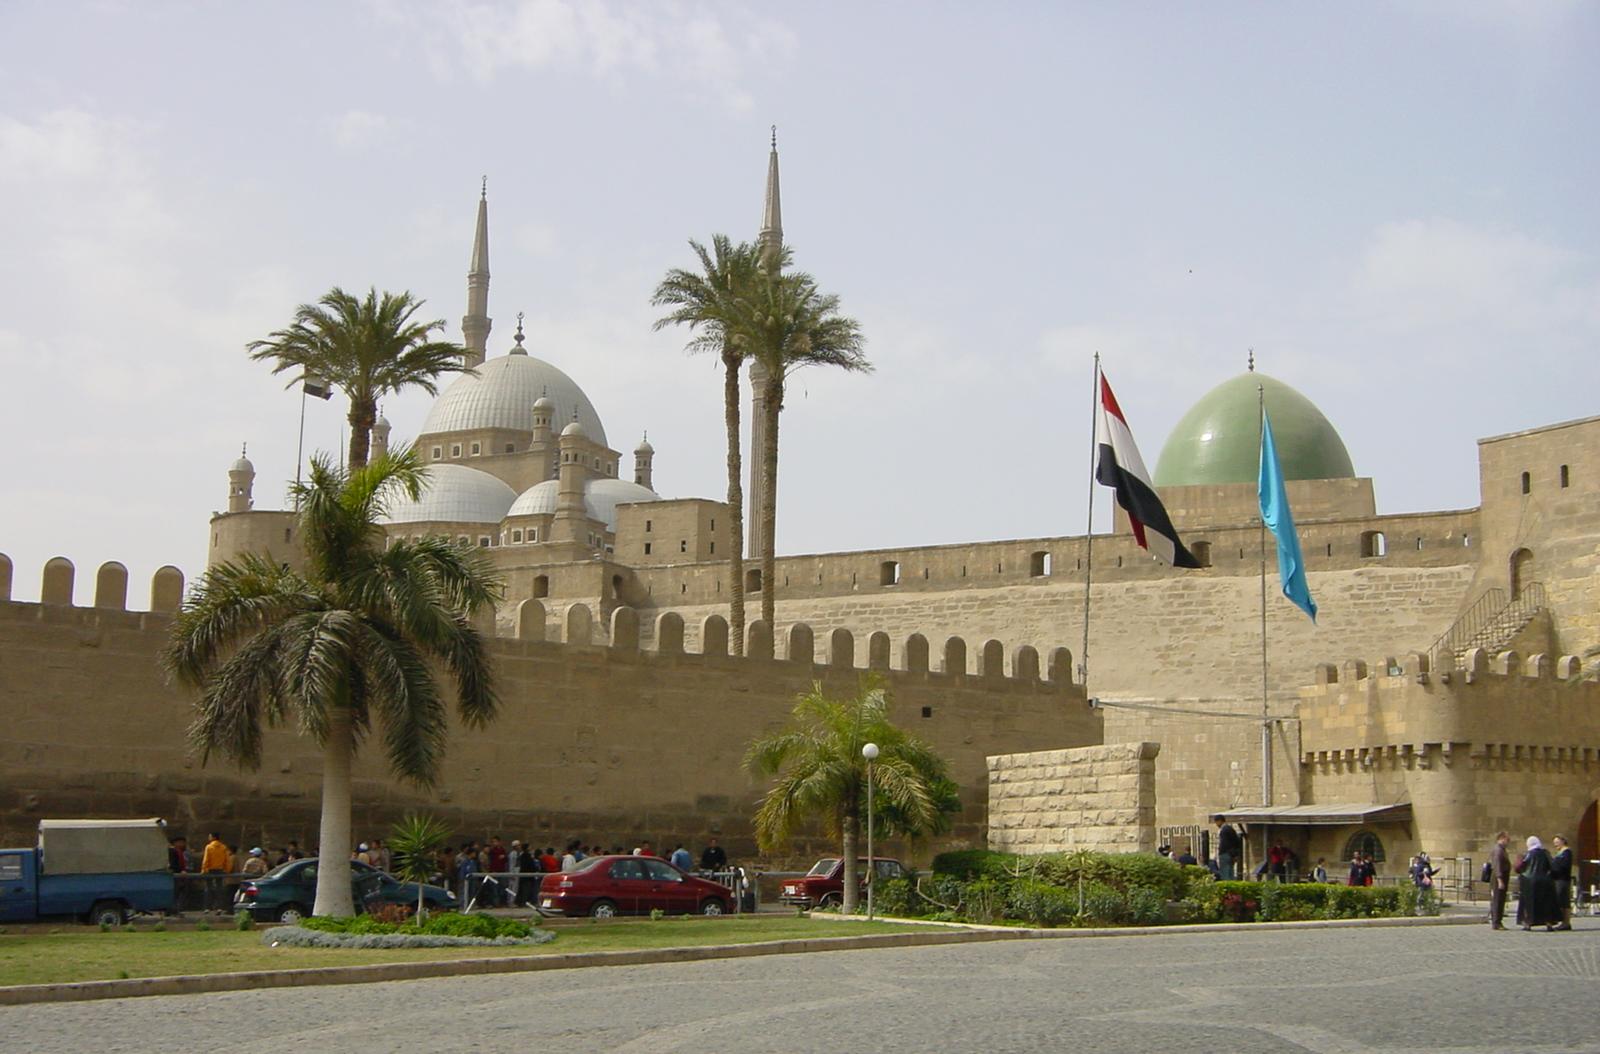 Citadel of Saladdin in Cairo